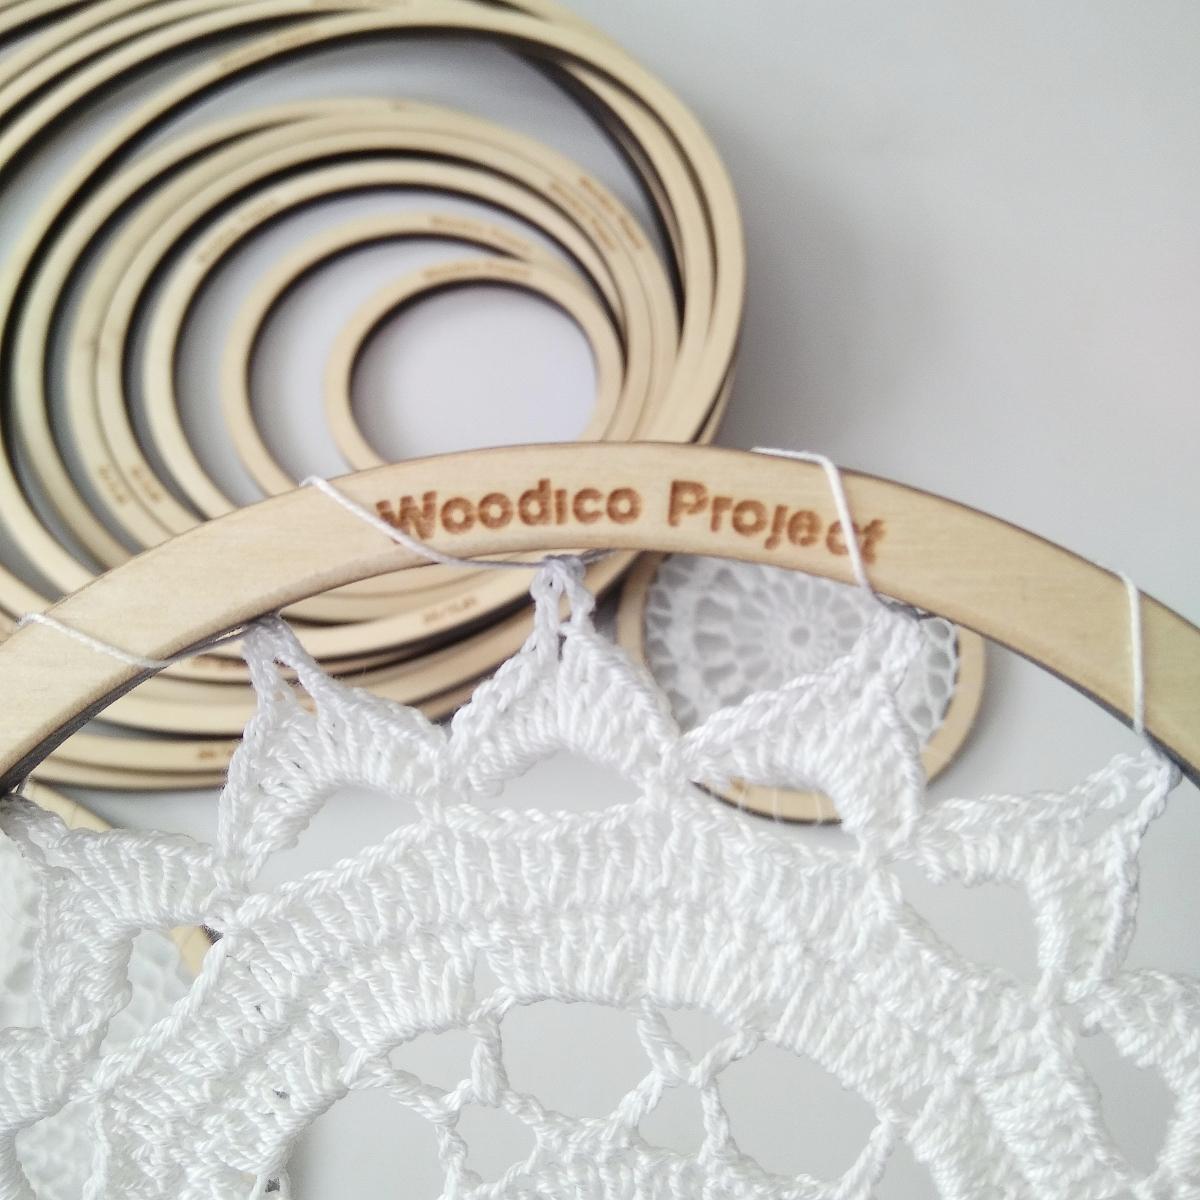 woodico.pro 1 1200x1200 - Dream catcher base / Set of 15 rings 12-40 cm